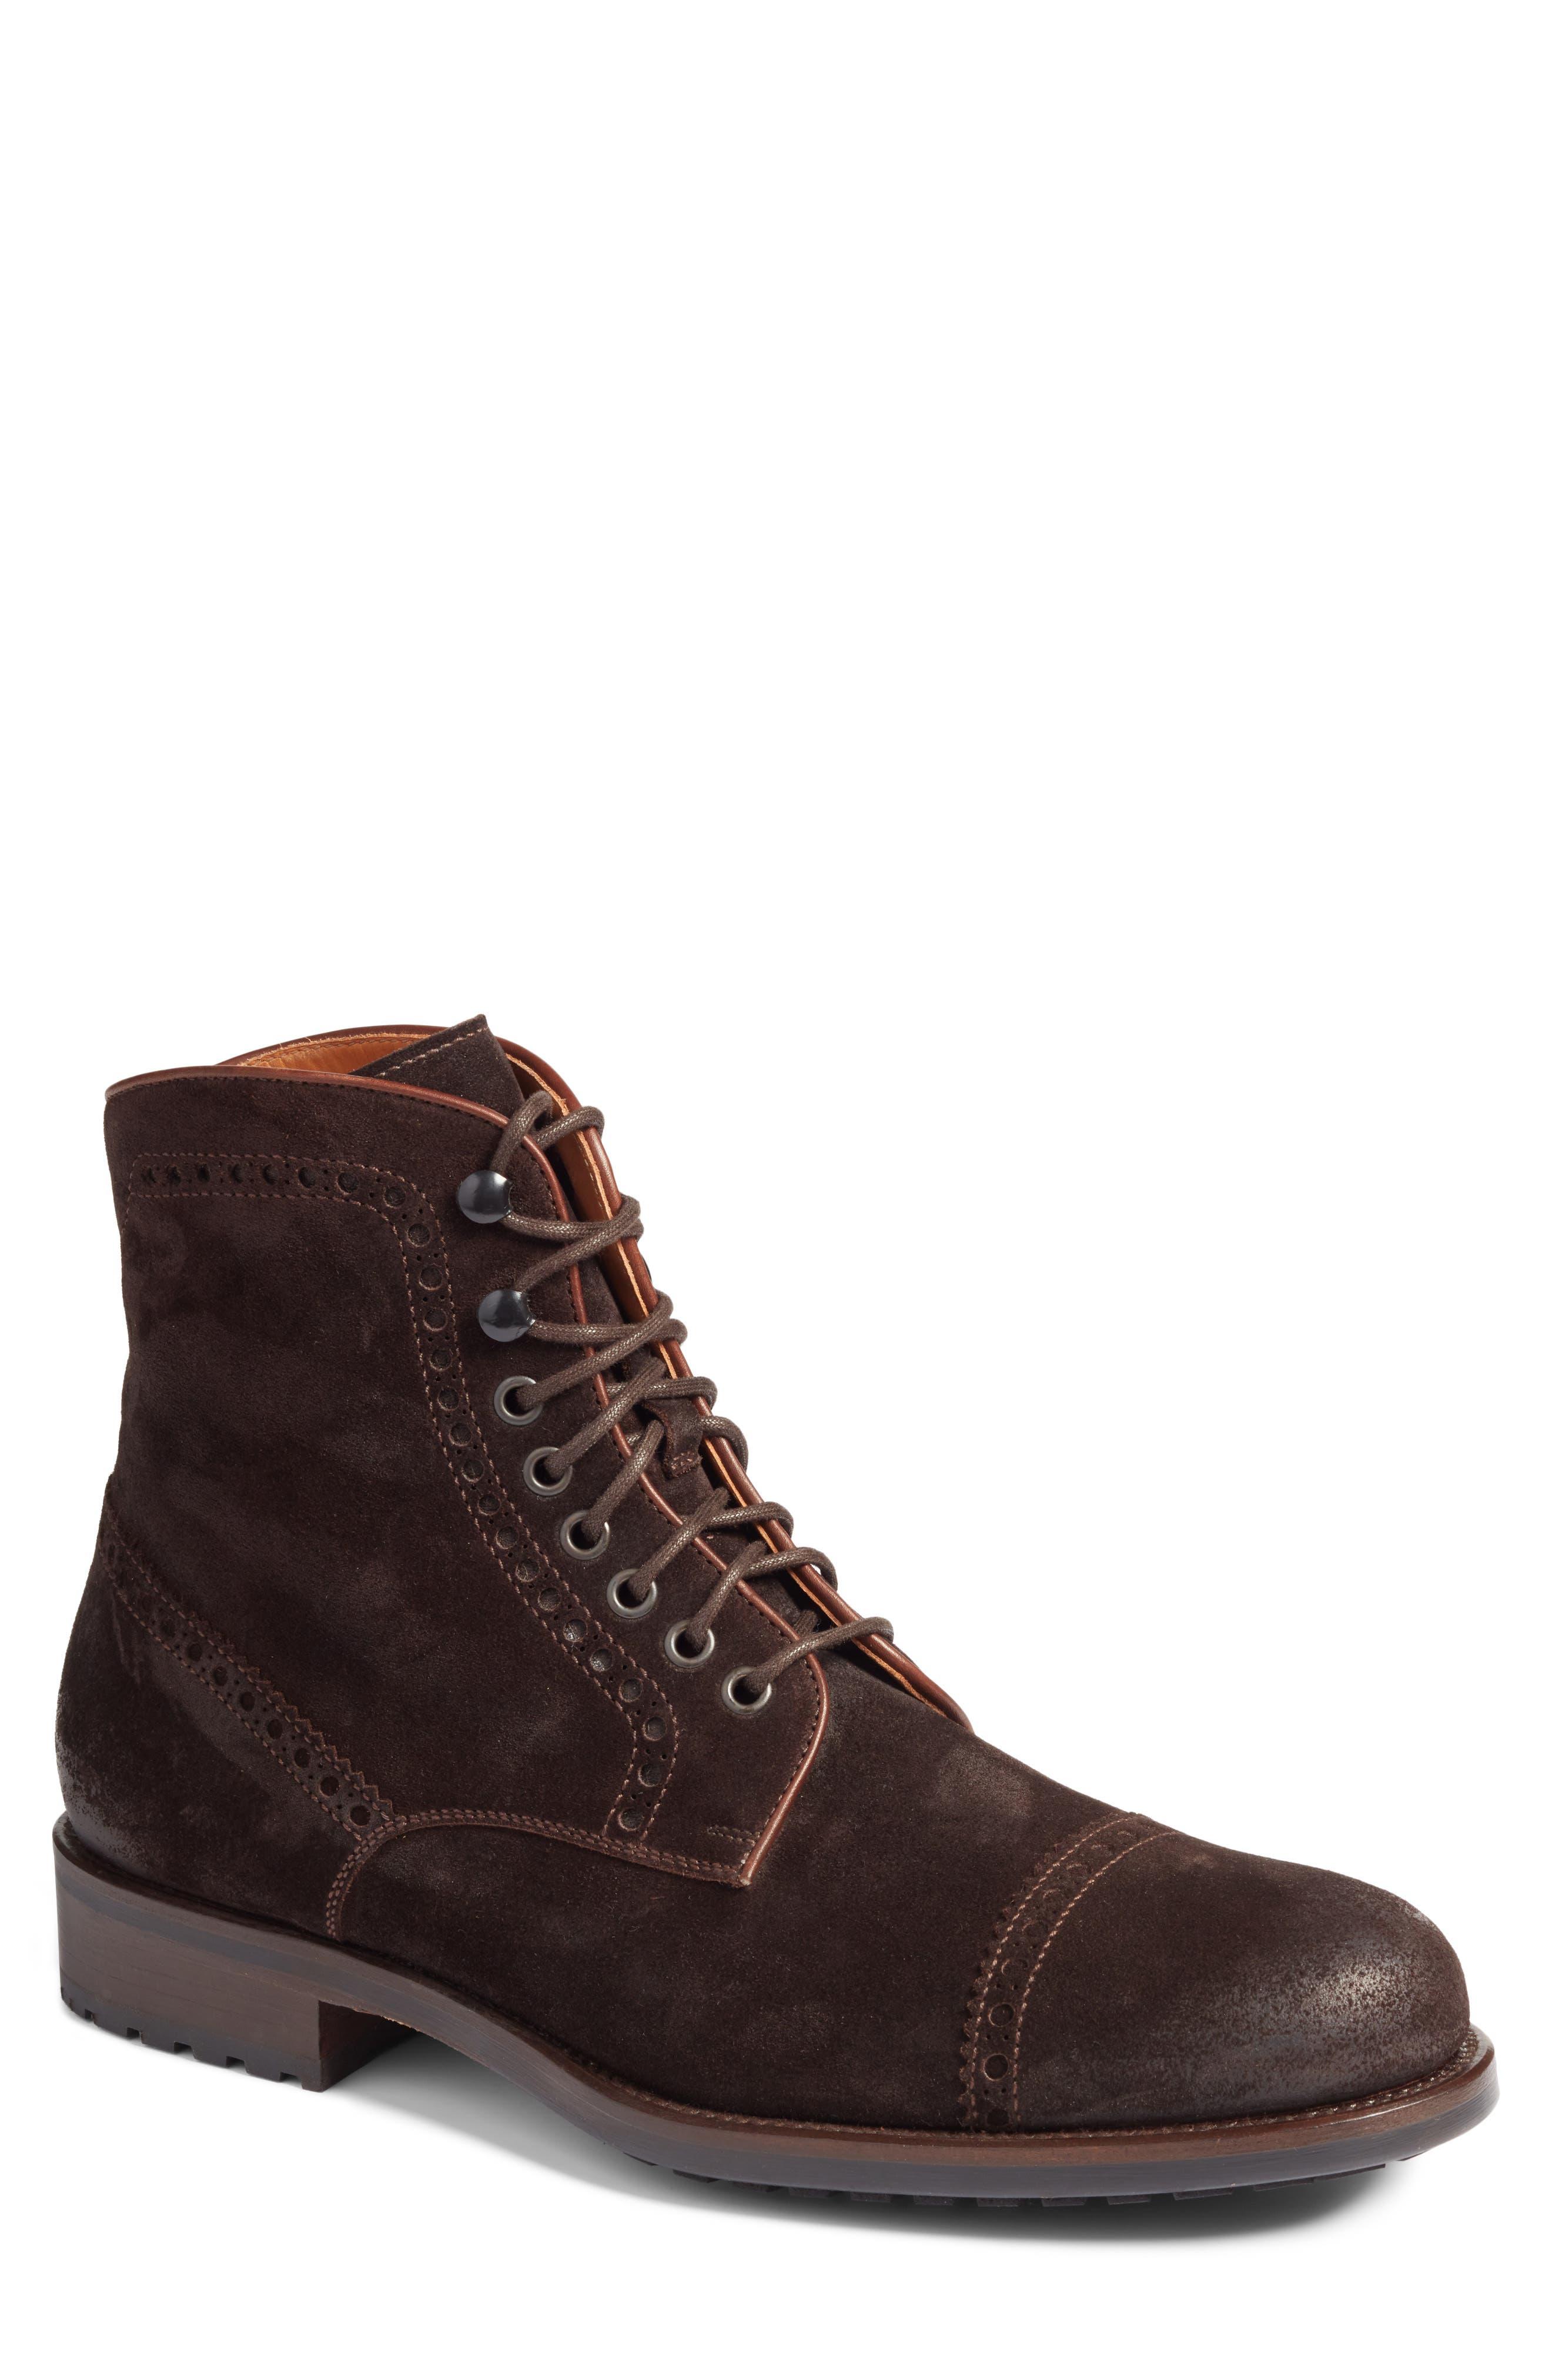 Palmer Cap Toe Boot,                         Main,                         color, 200